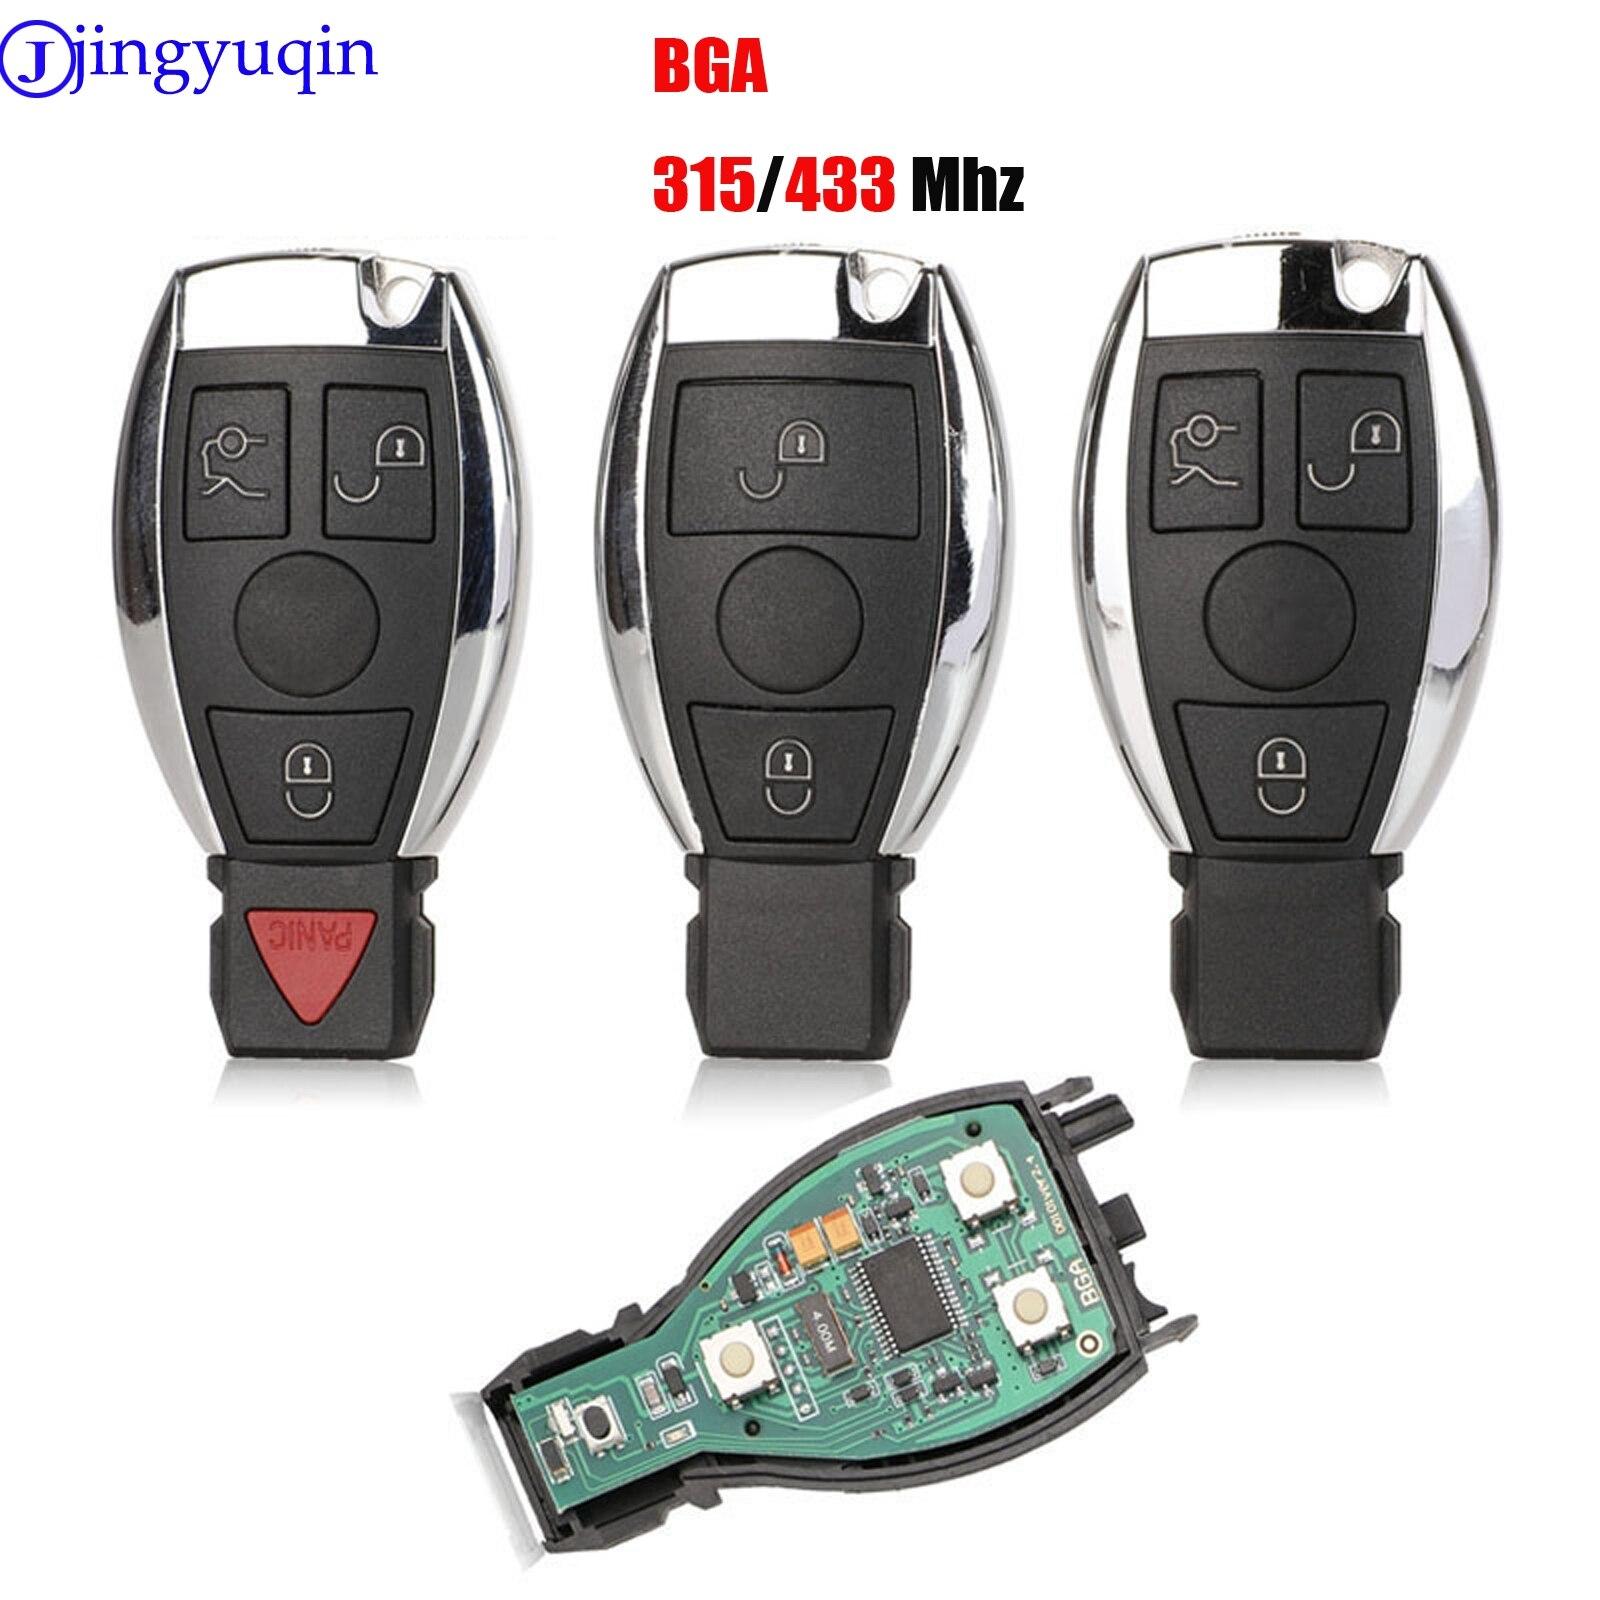 Jingyuqin مفتاح بعيد الذكية لمرسيدس بنز عام 2000 + يدعم الأصلي NEC و BGA 315MHz أو 433.92MHz 3 أزرار